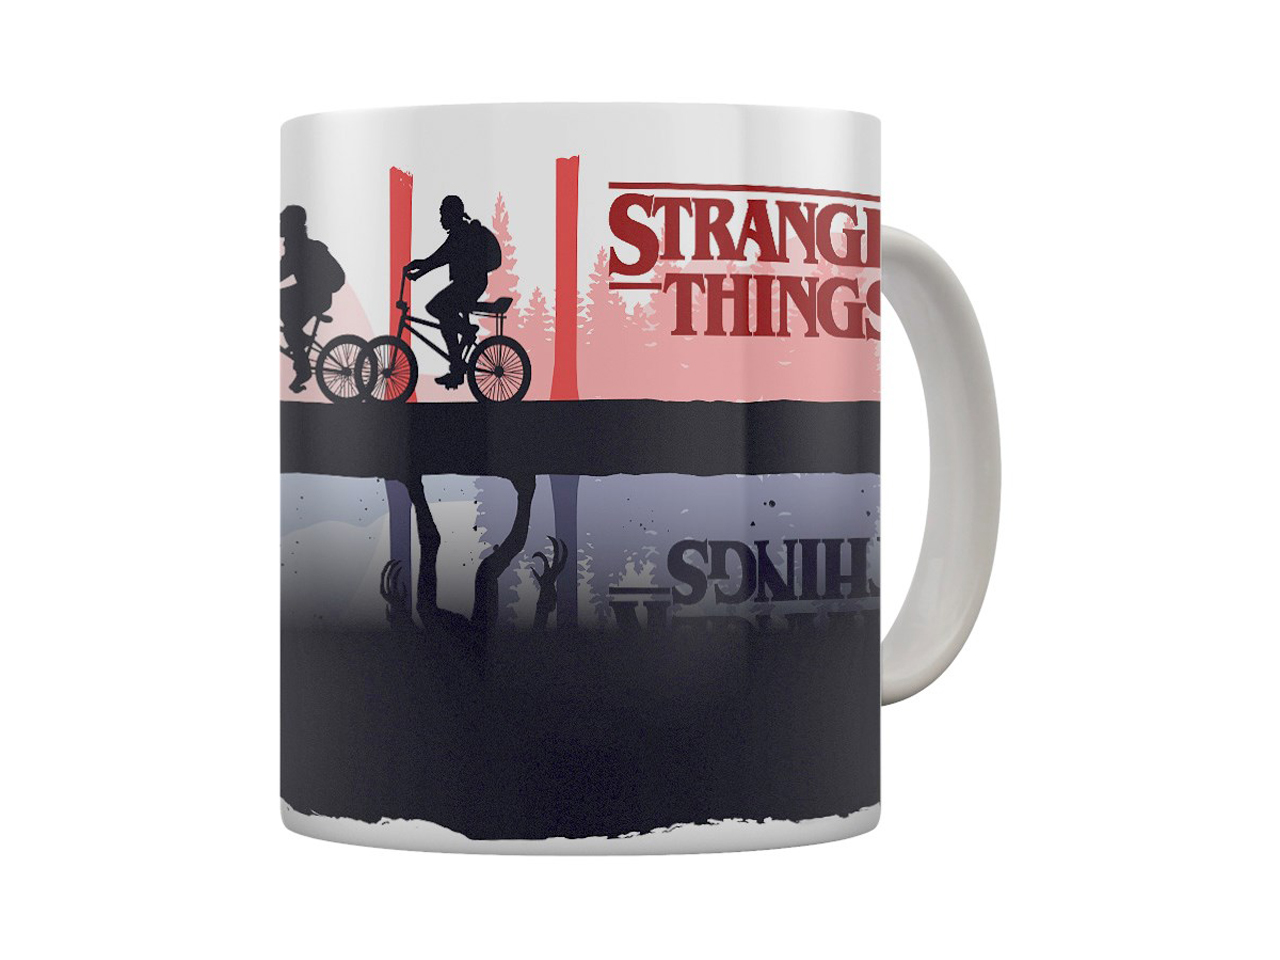 Official Stranger Things Heat Changing Mug Demogorgon Hawkins Mind Flayer Netflix Pyramid International Drinkware Kitchenware Home Decor